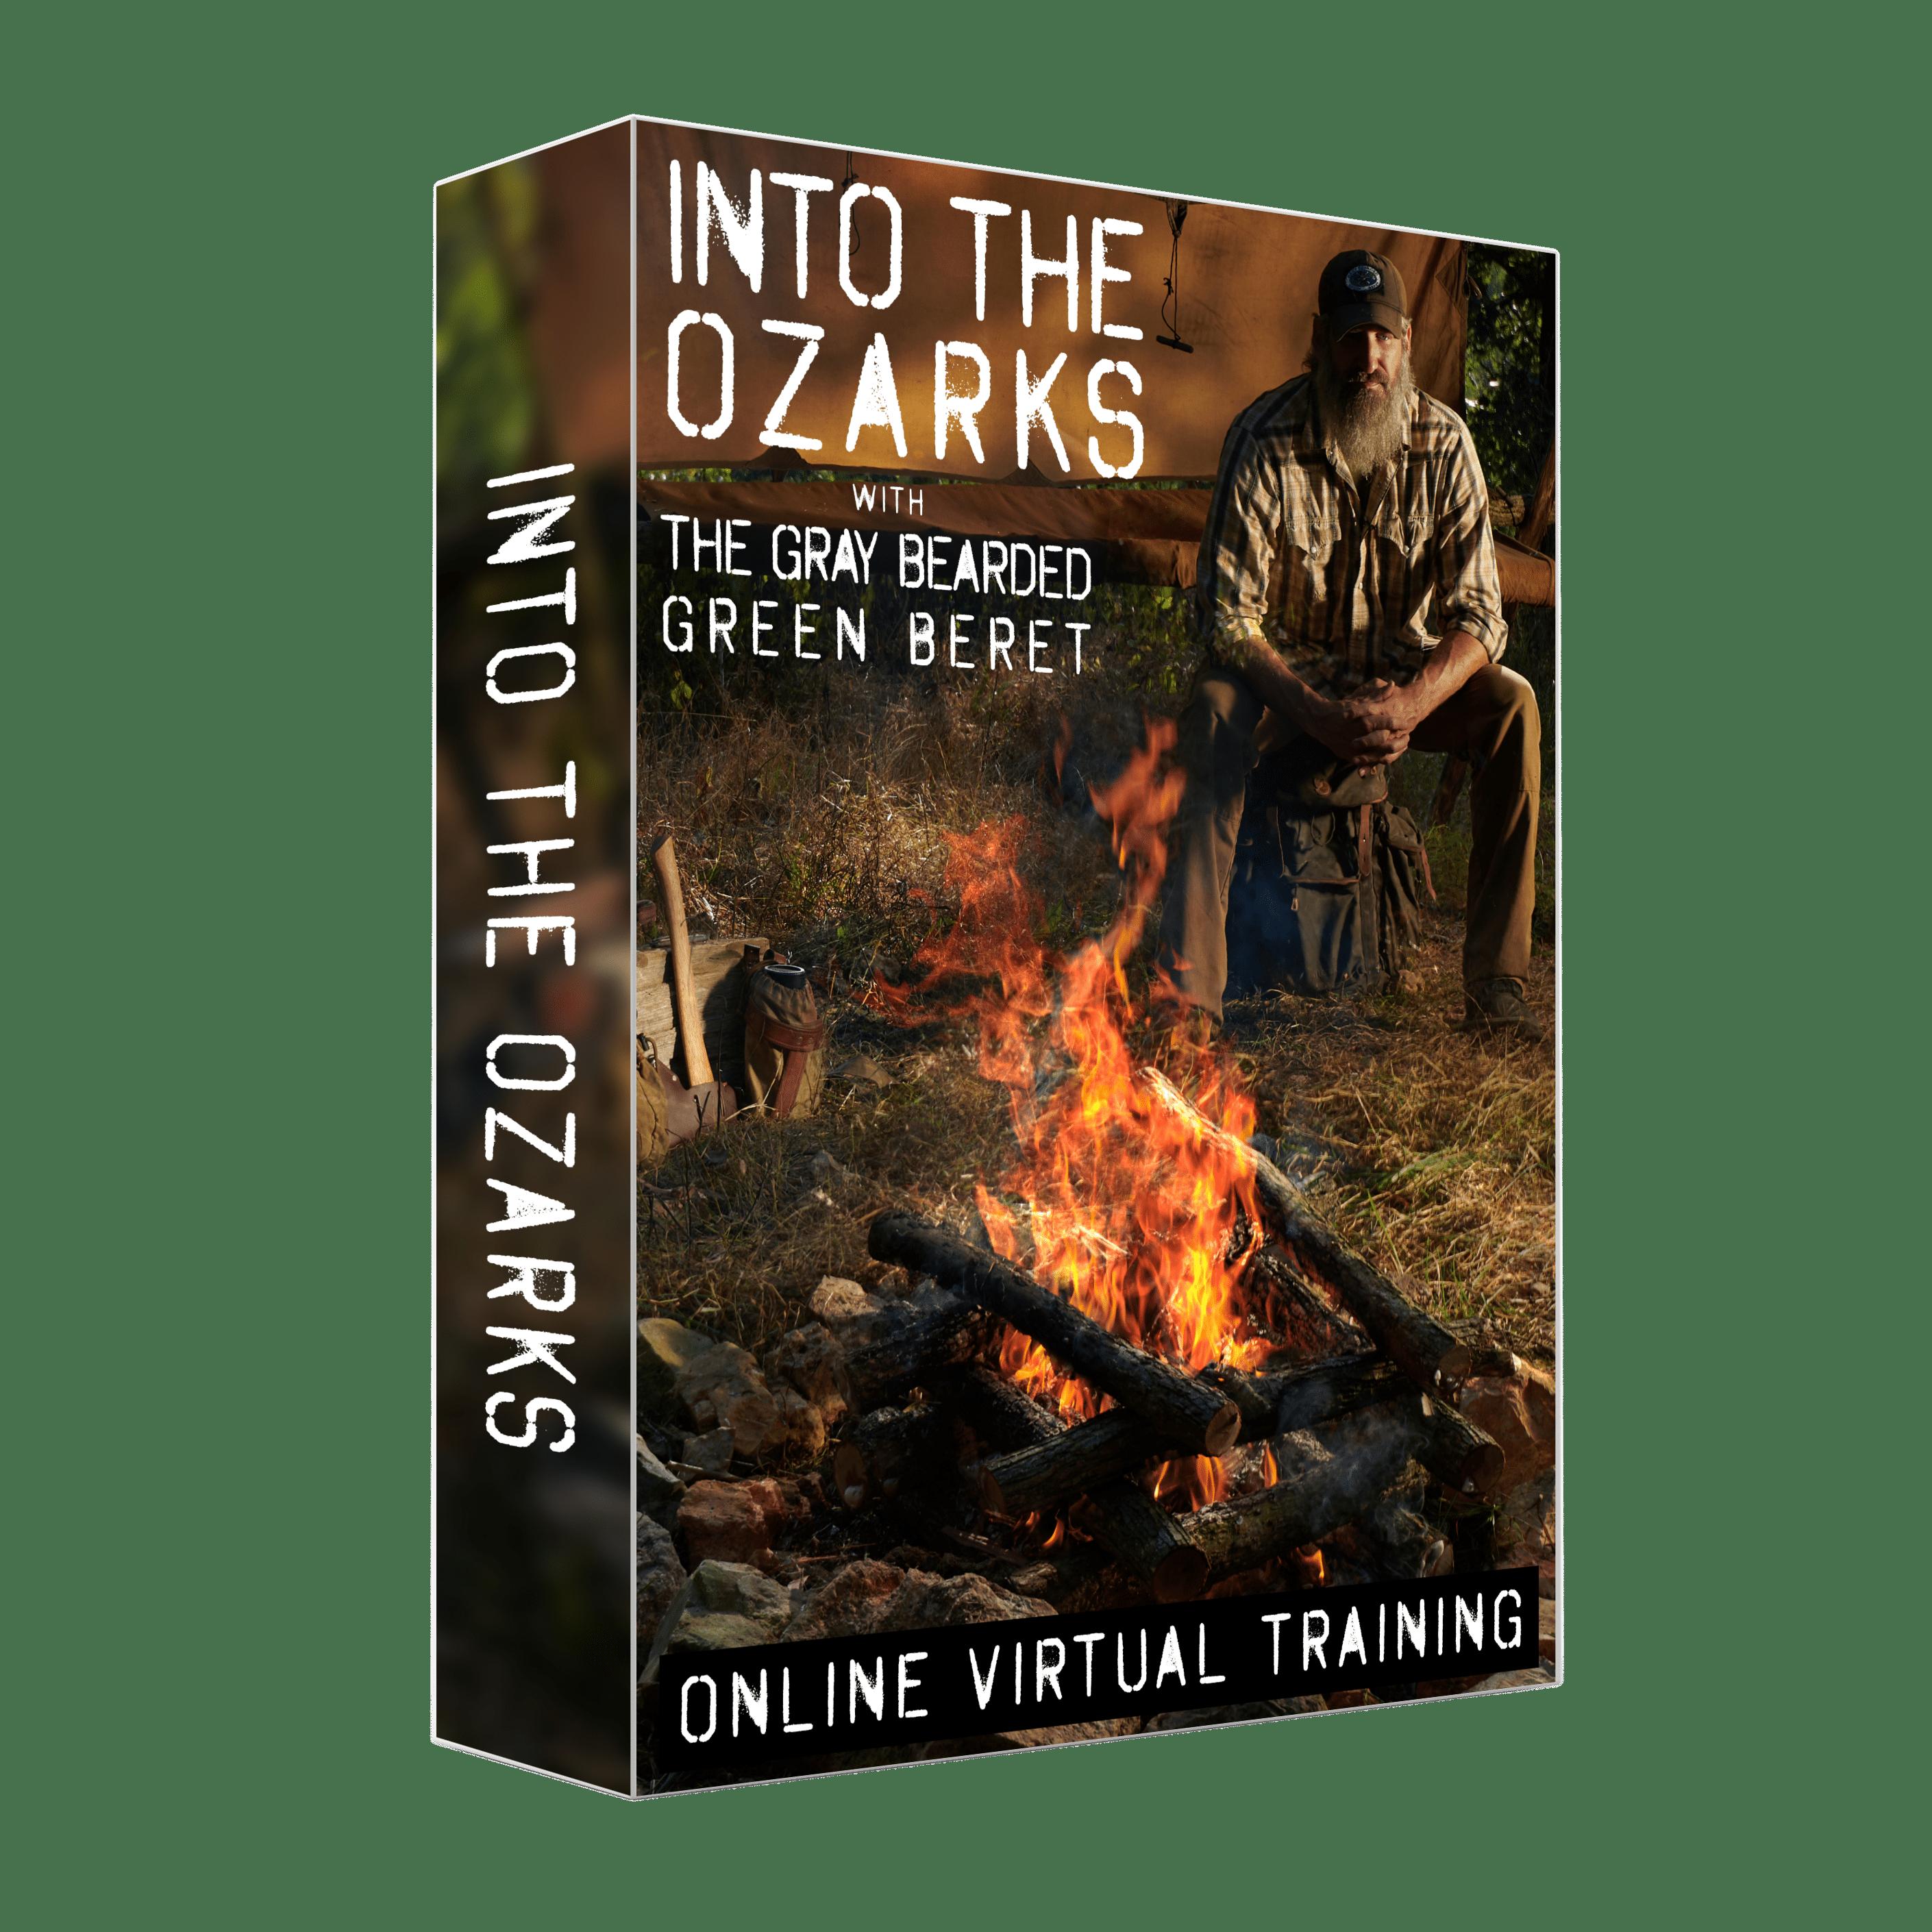 Into the Ozarks